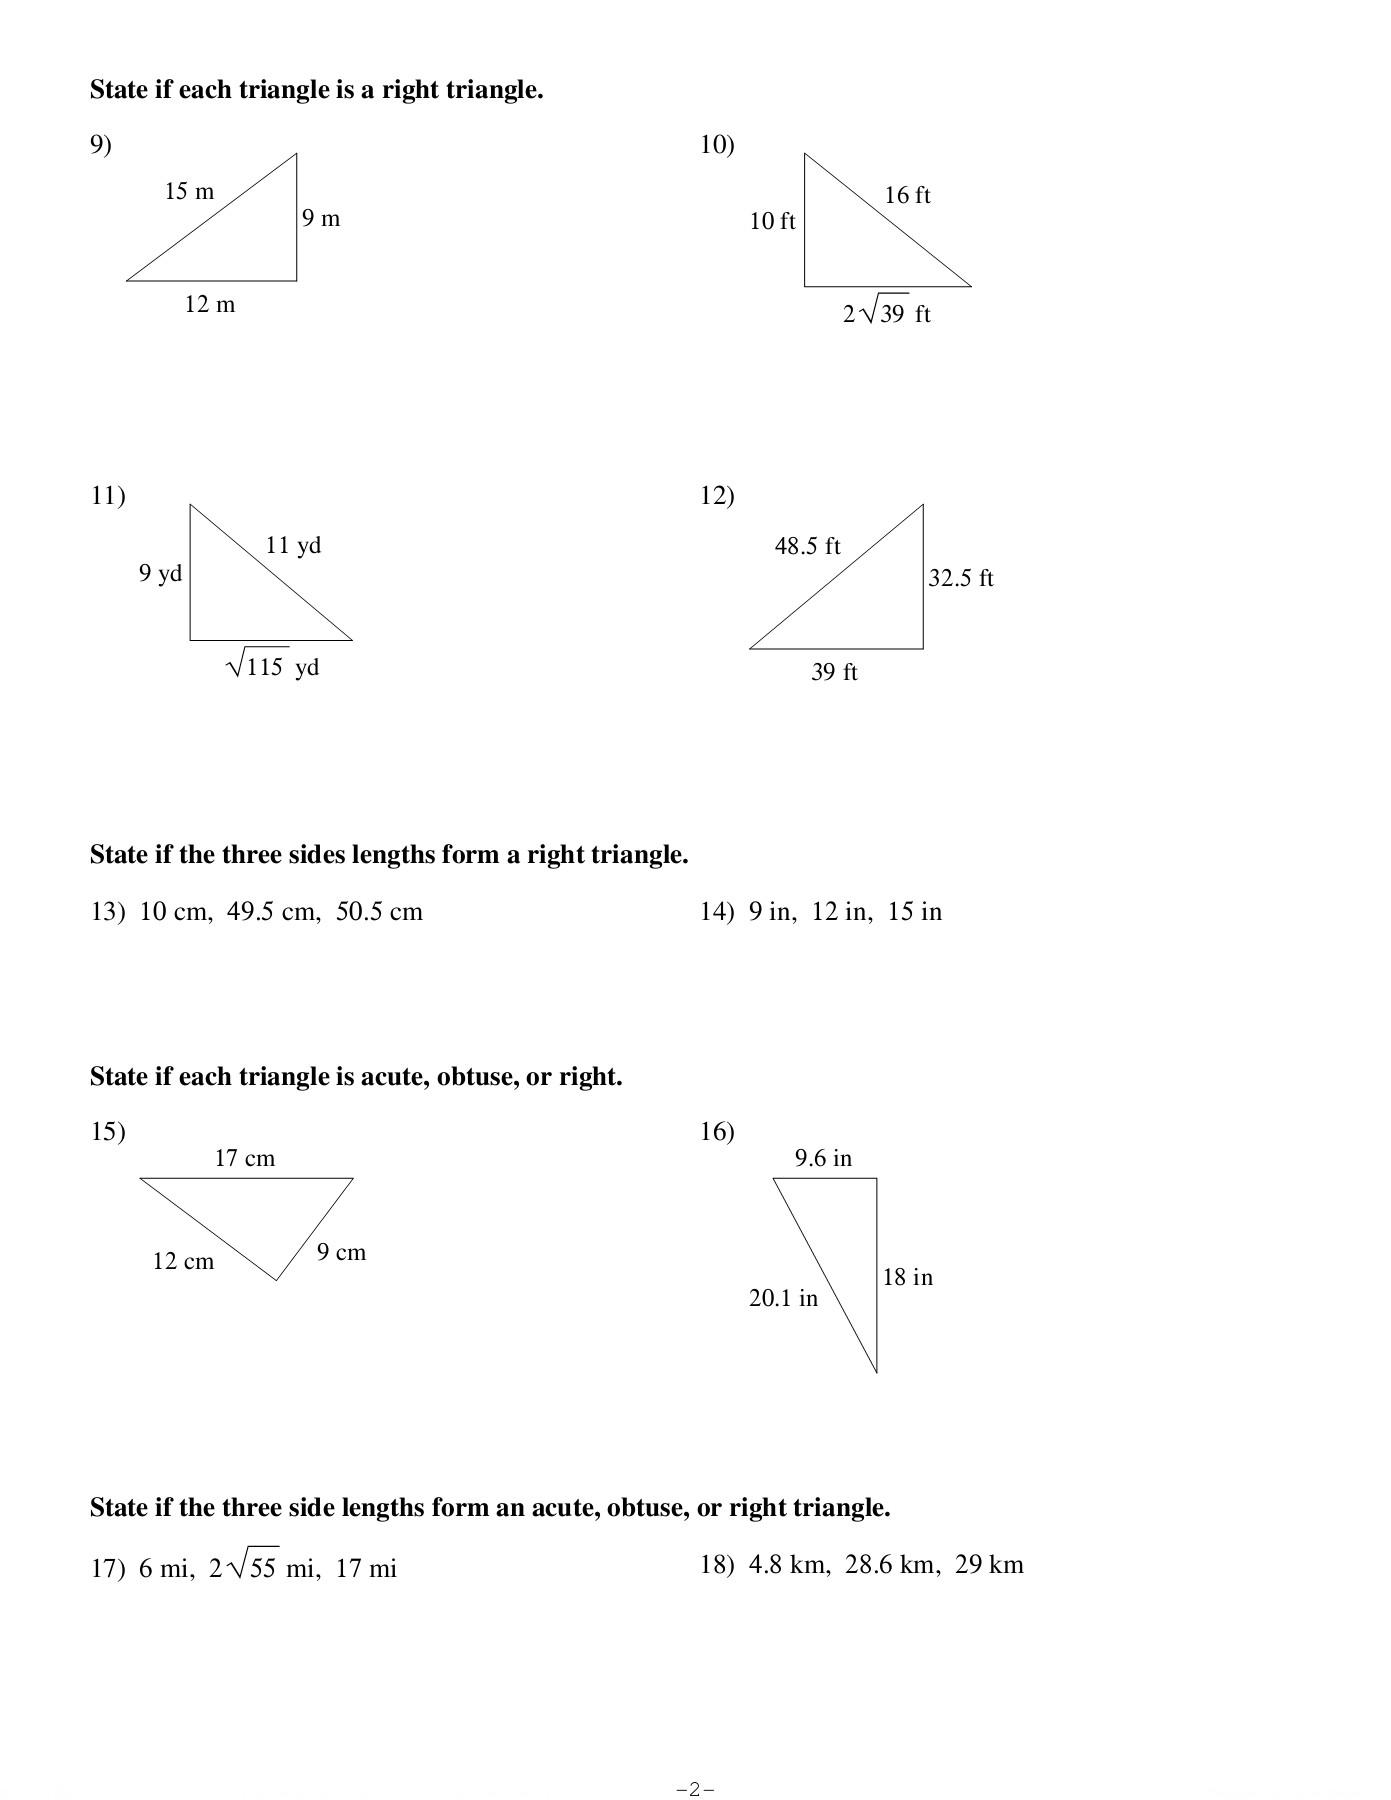 medium resolution of فوضوي الصبر فارغة the pythagorean theorem and its converse answers -  pleasantgroveumc.net